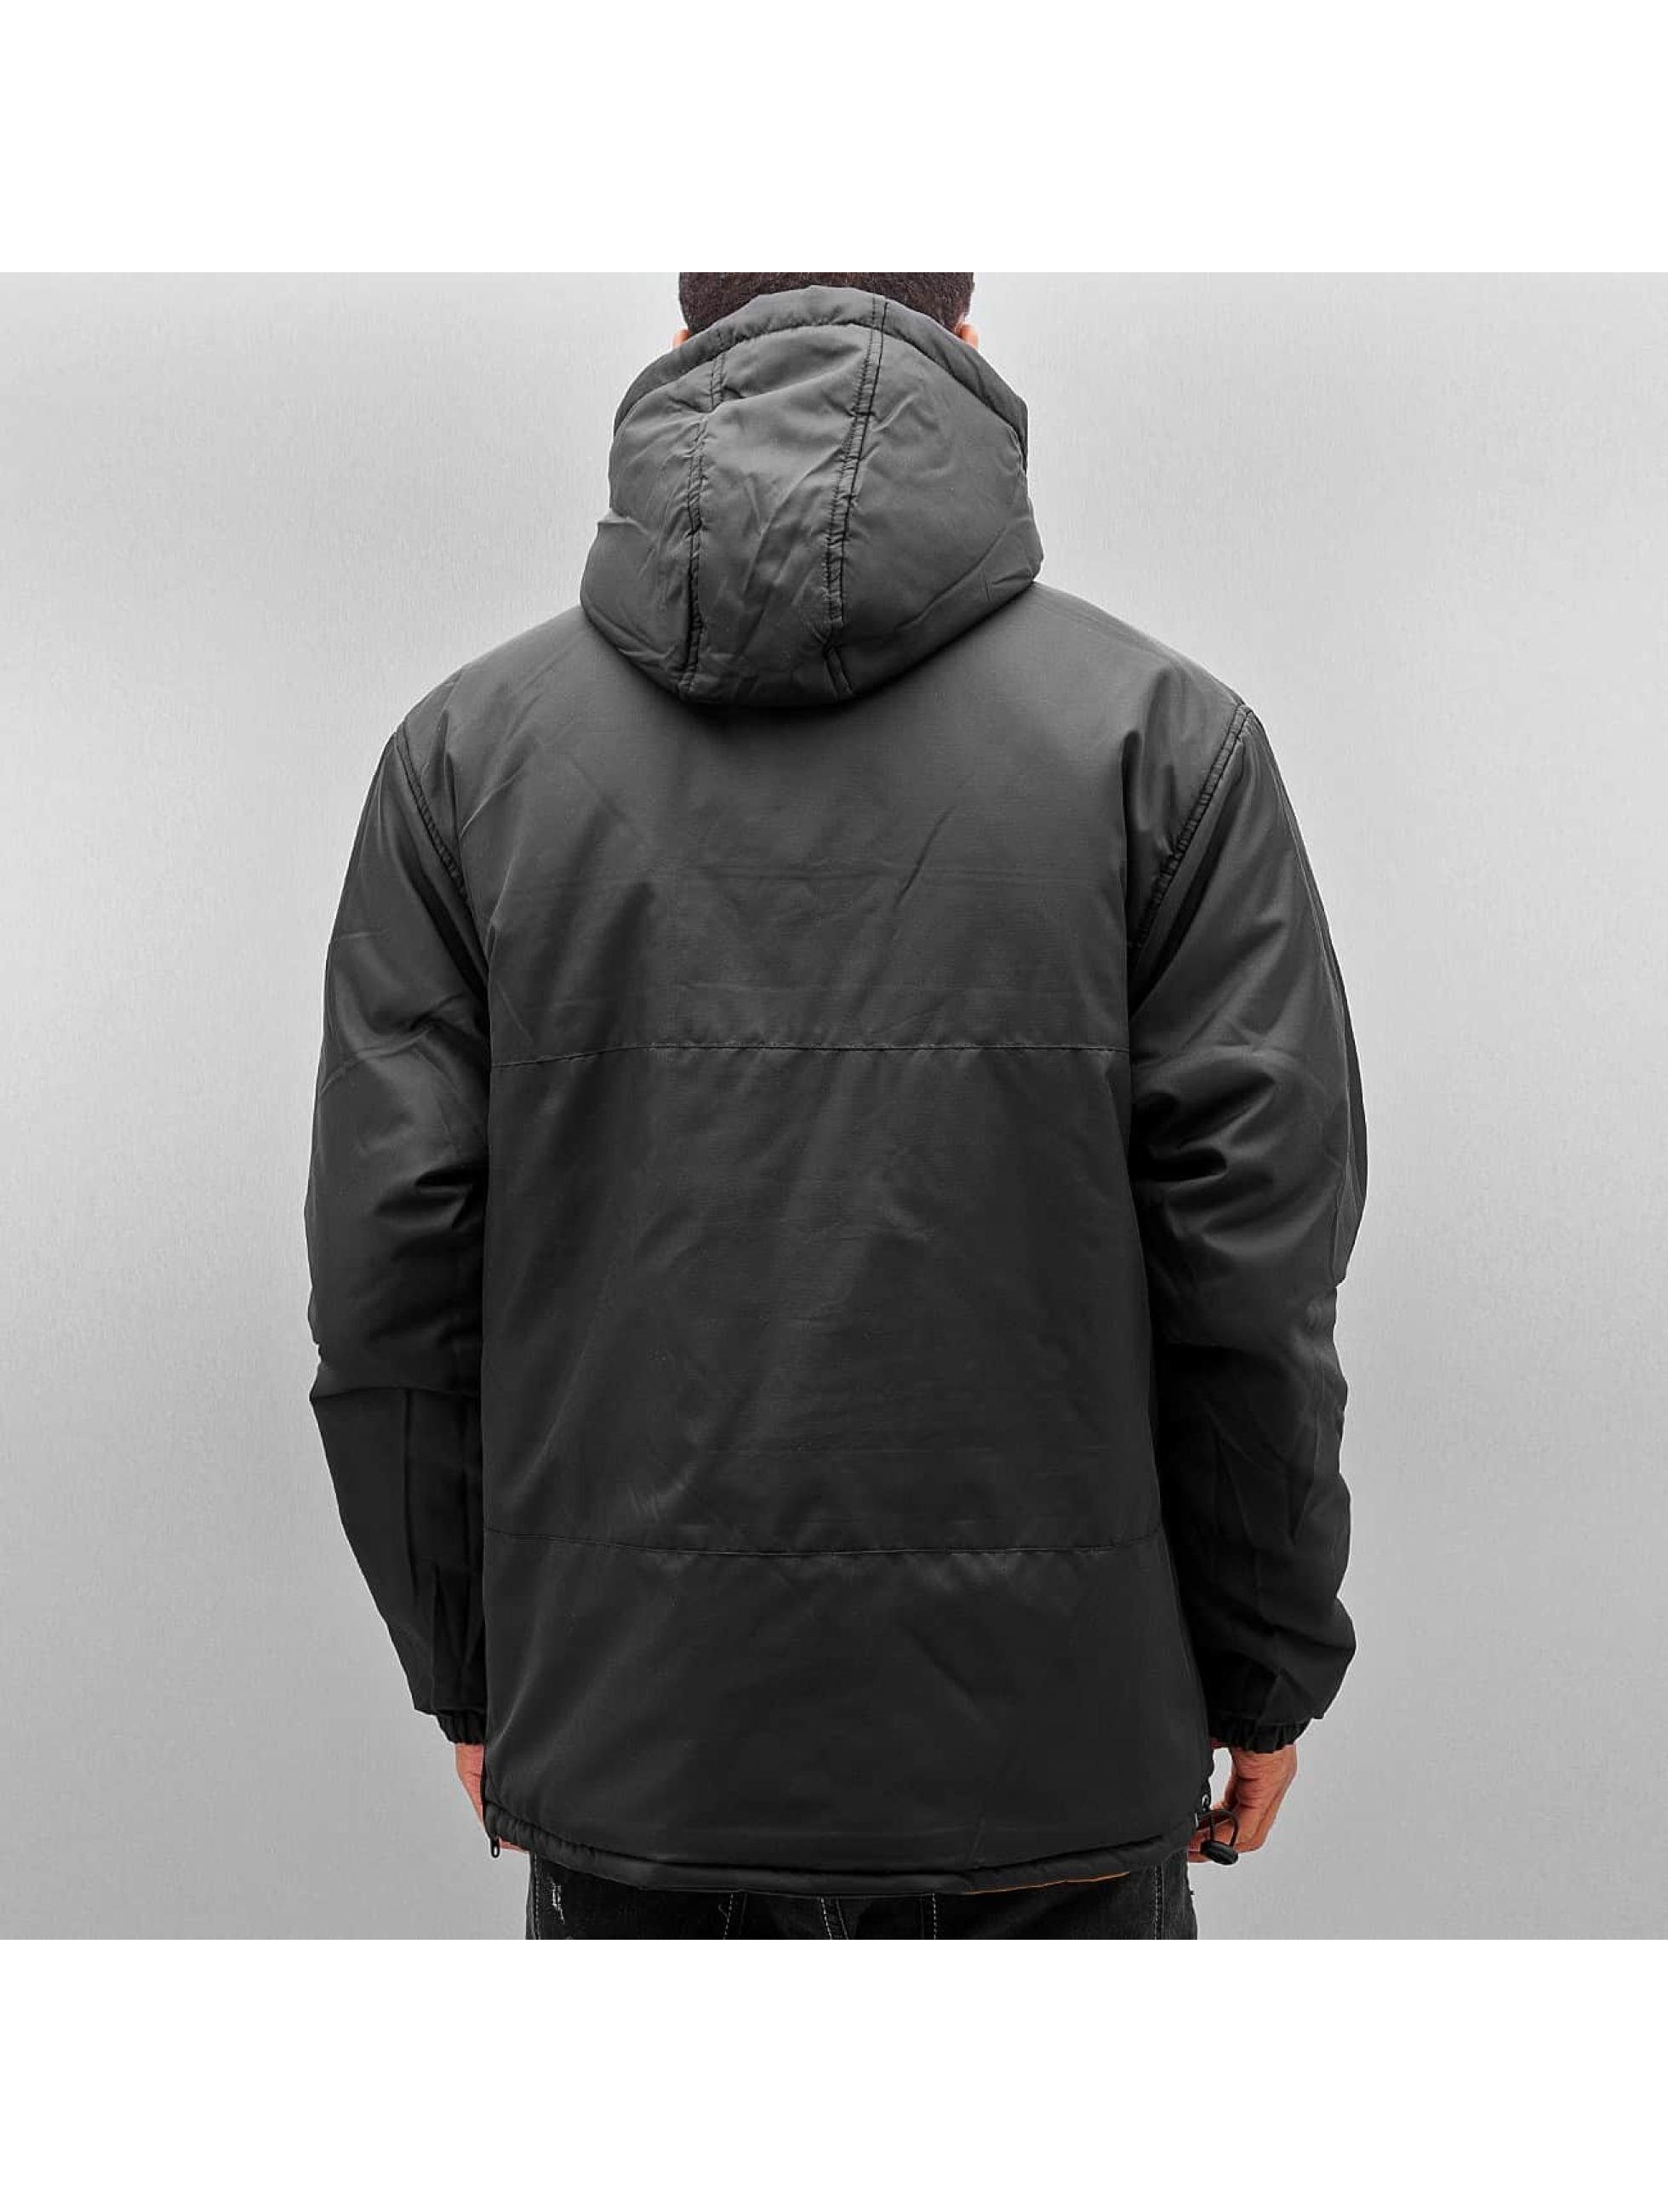 Grimey Wear Lightweight Jacket Smoky Alley Reversible camouflage